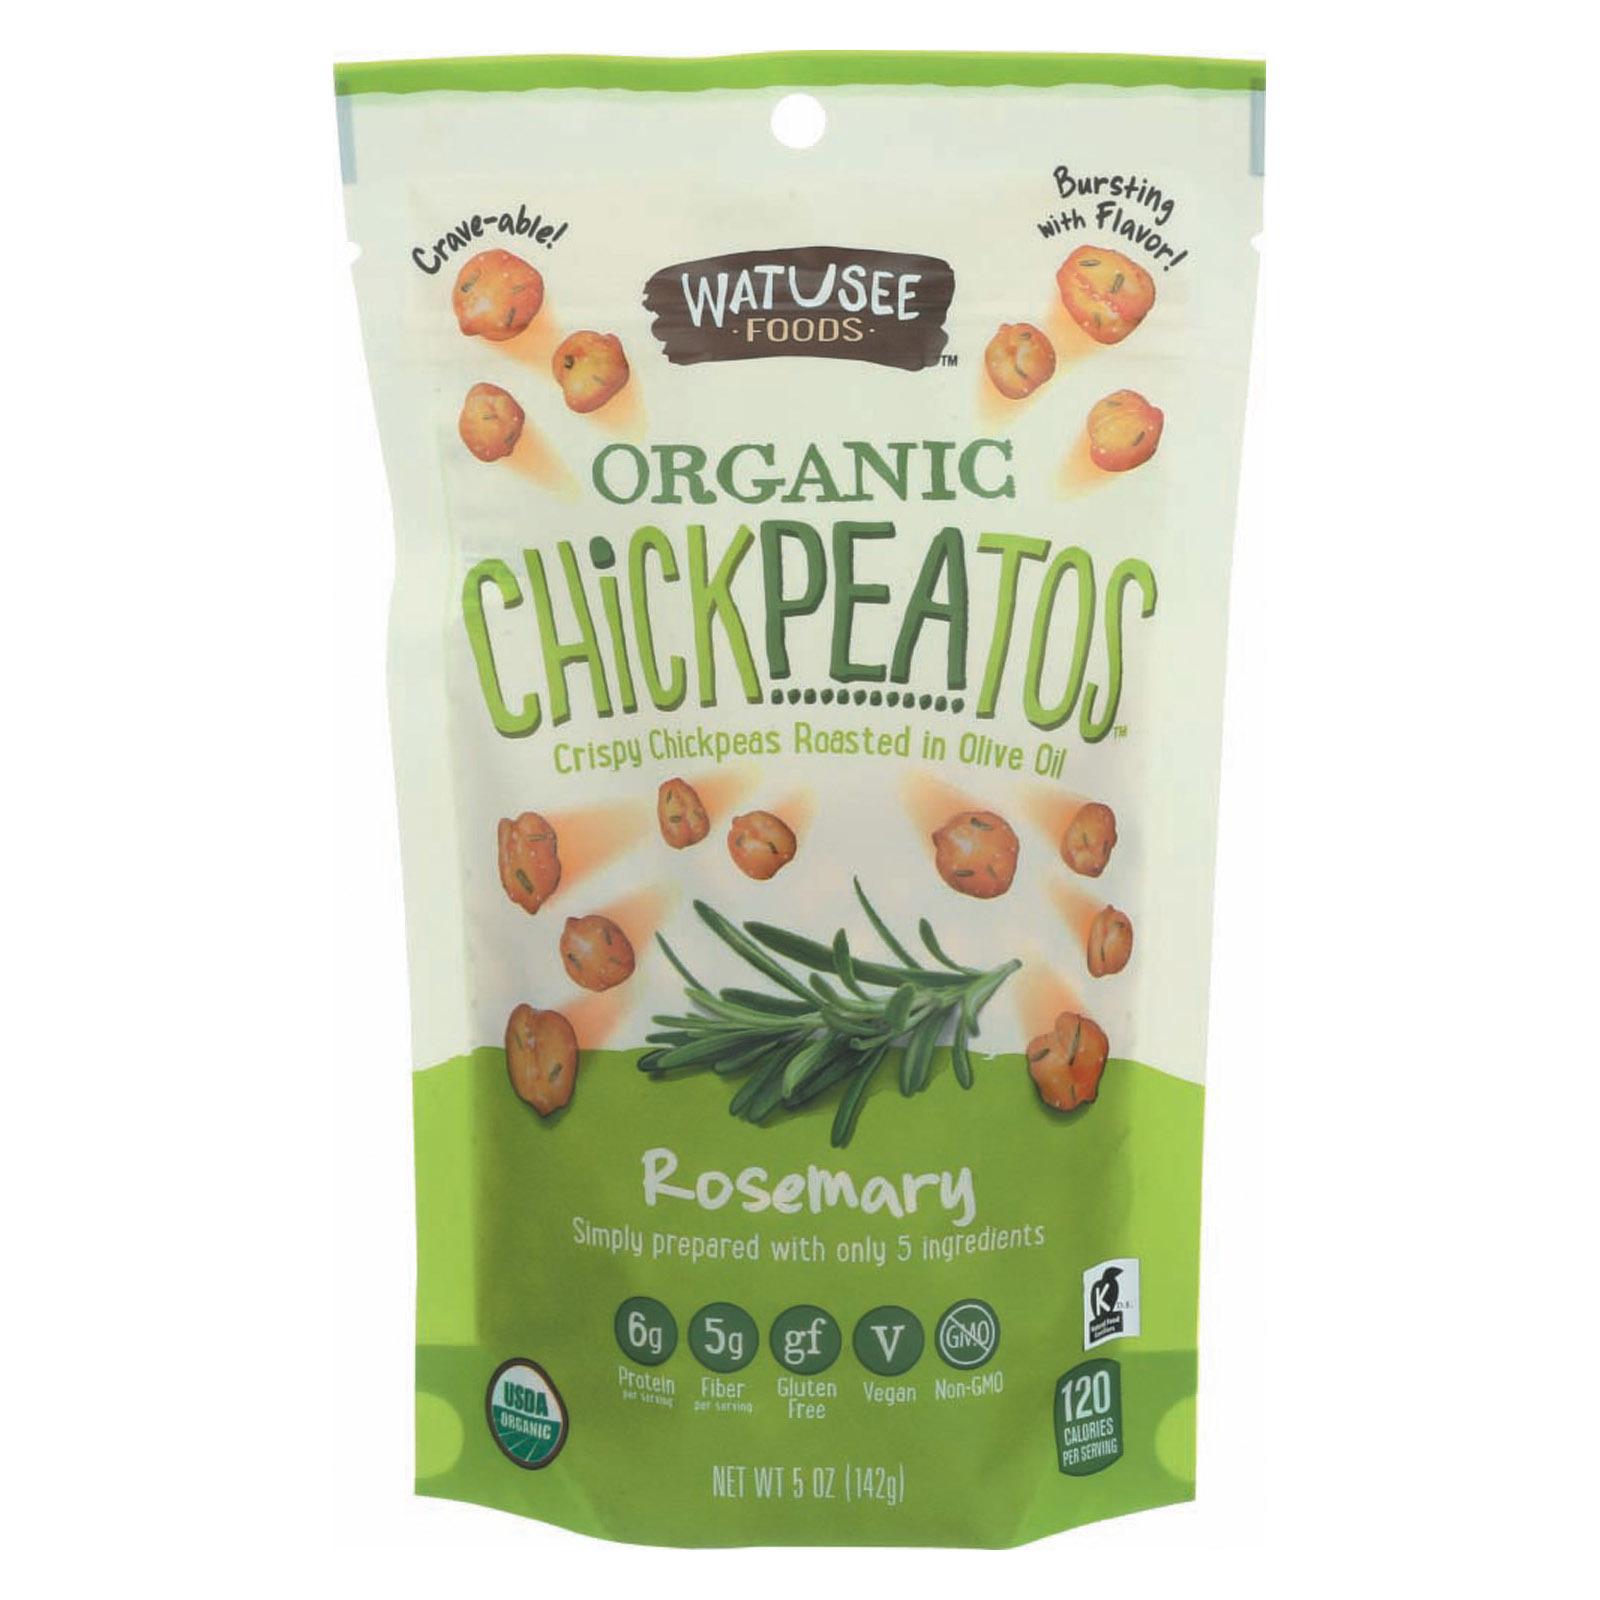 Watusee Foods Organic Chickpeas - Rosemary - Case of 12 - 5 oz